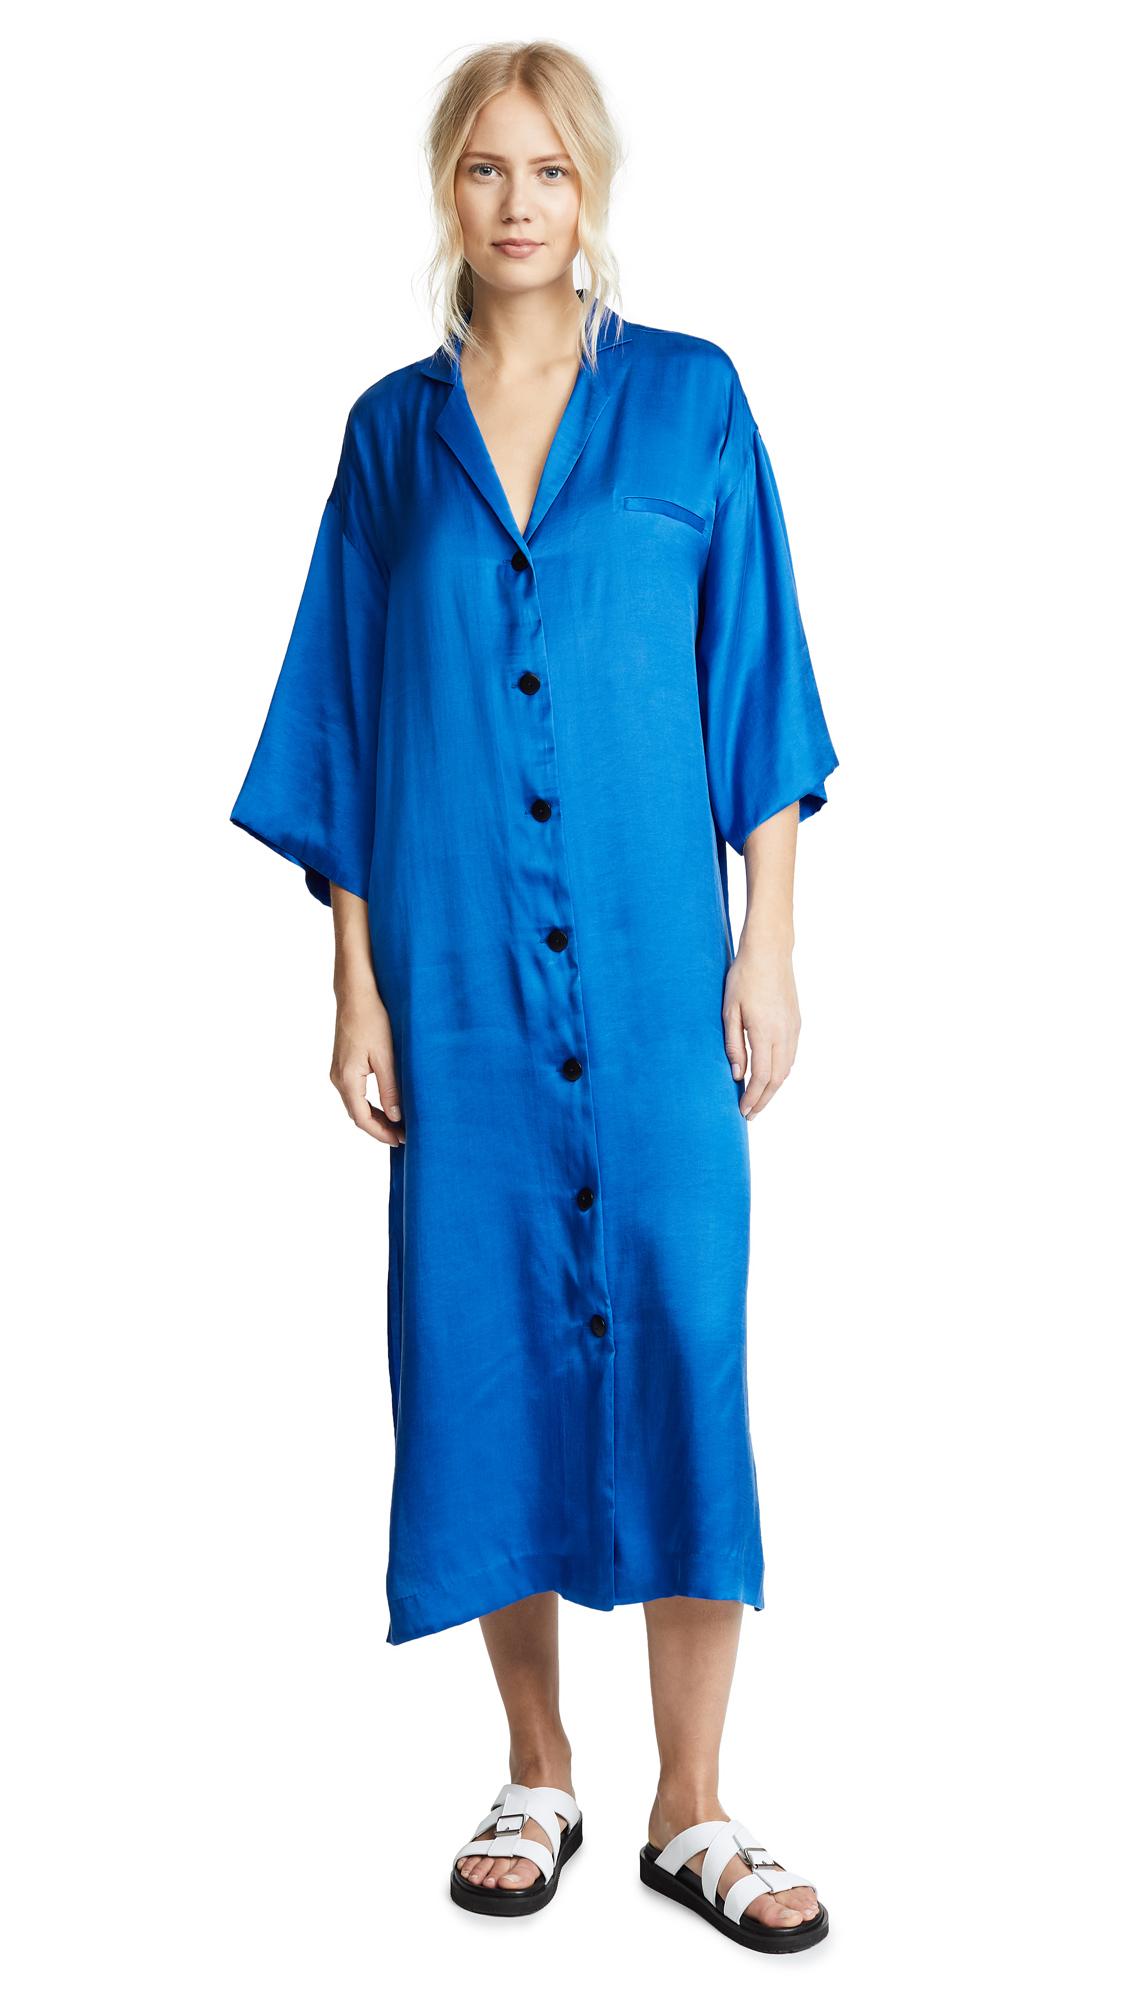 SAGA SHIRT DRESS